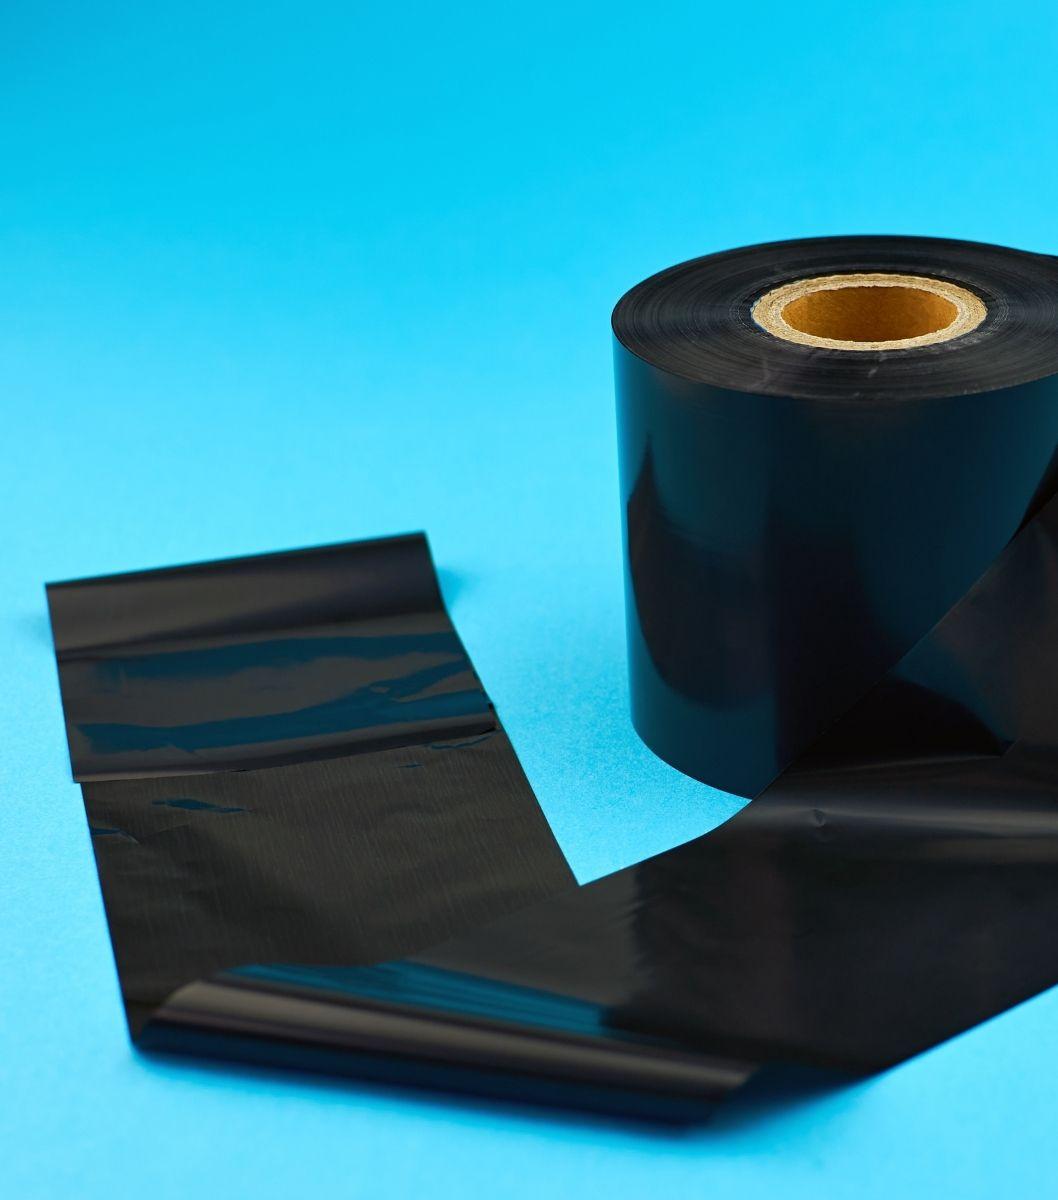 Ribbons for Thermal Transfer Printers